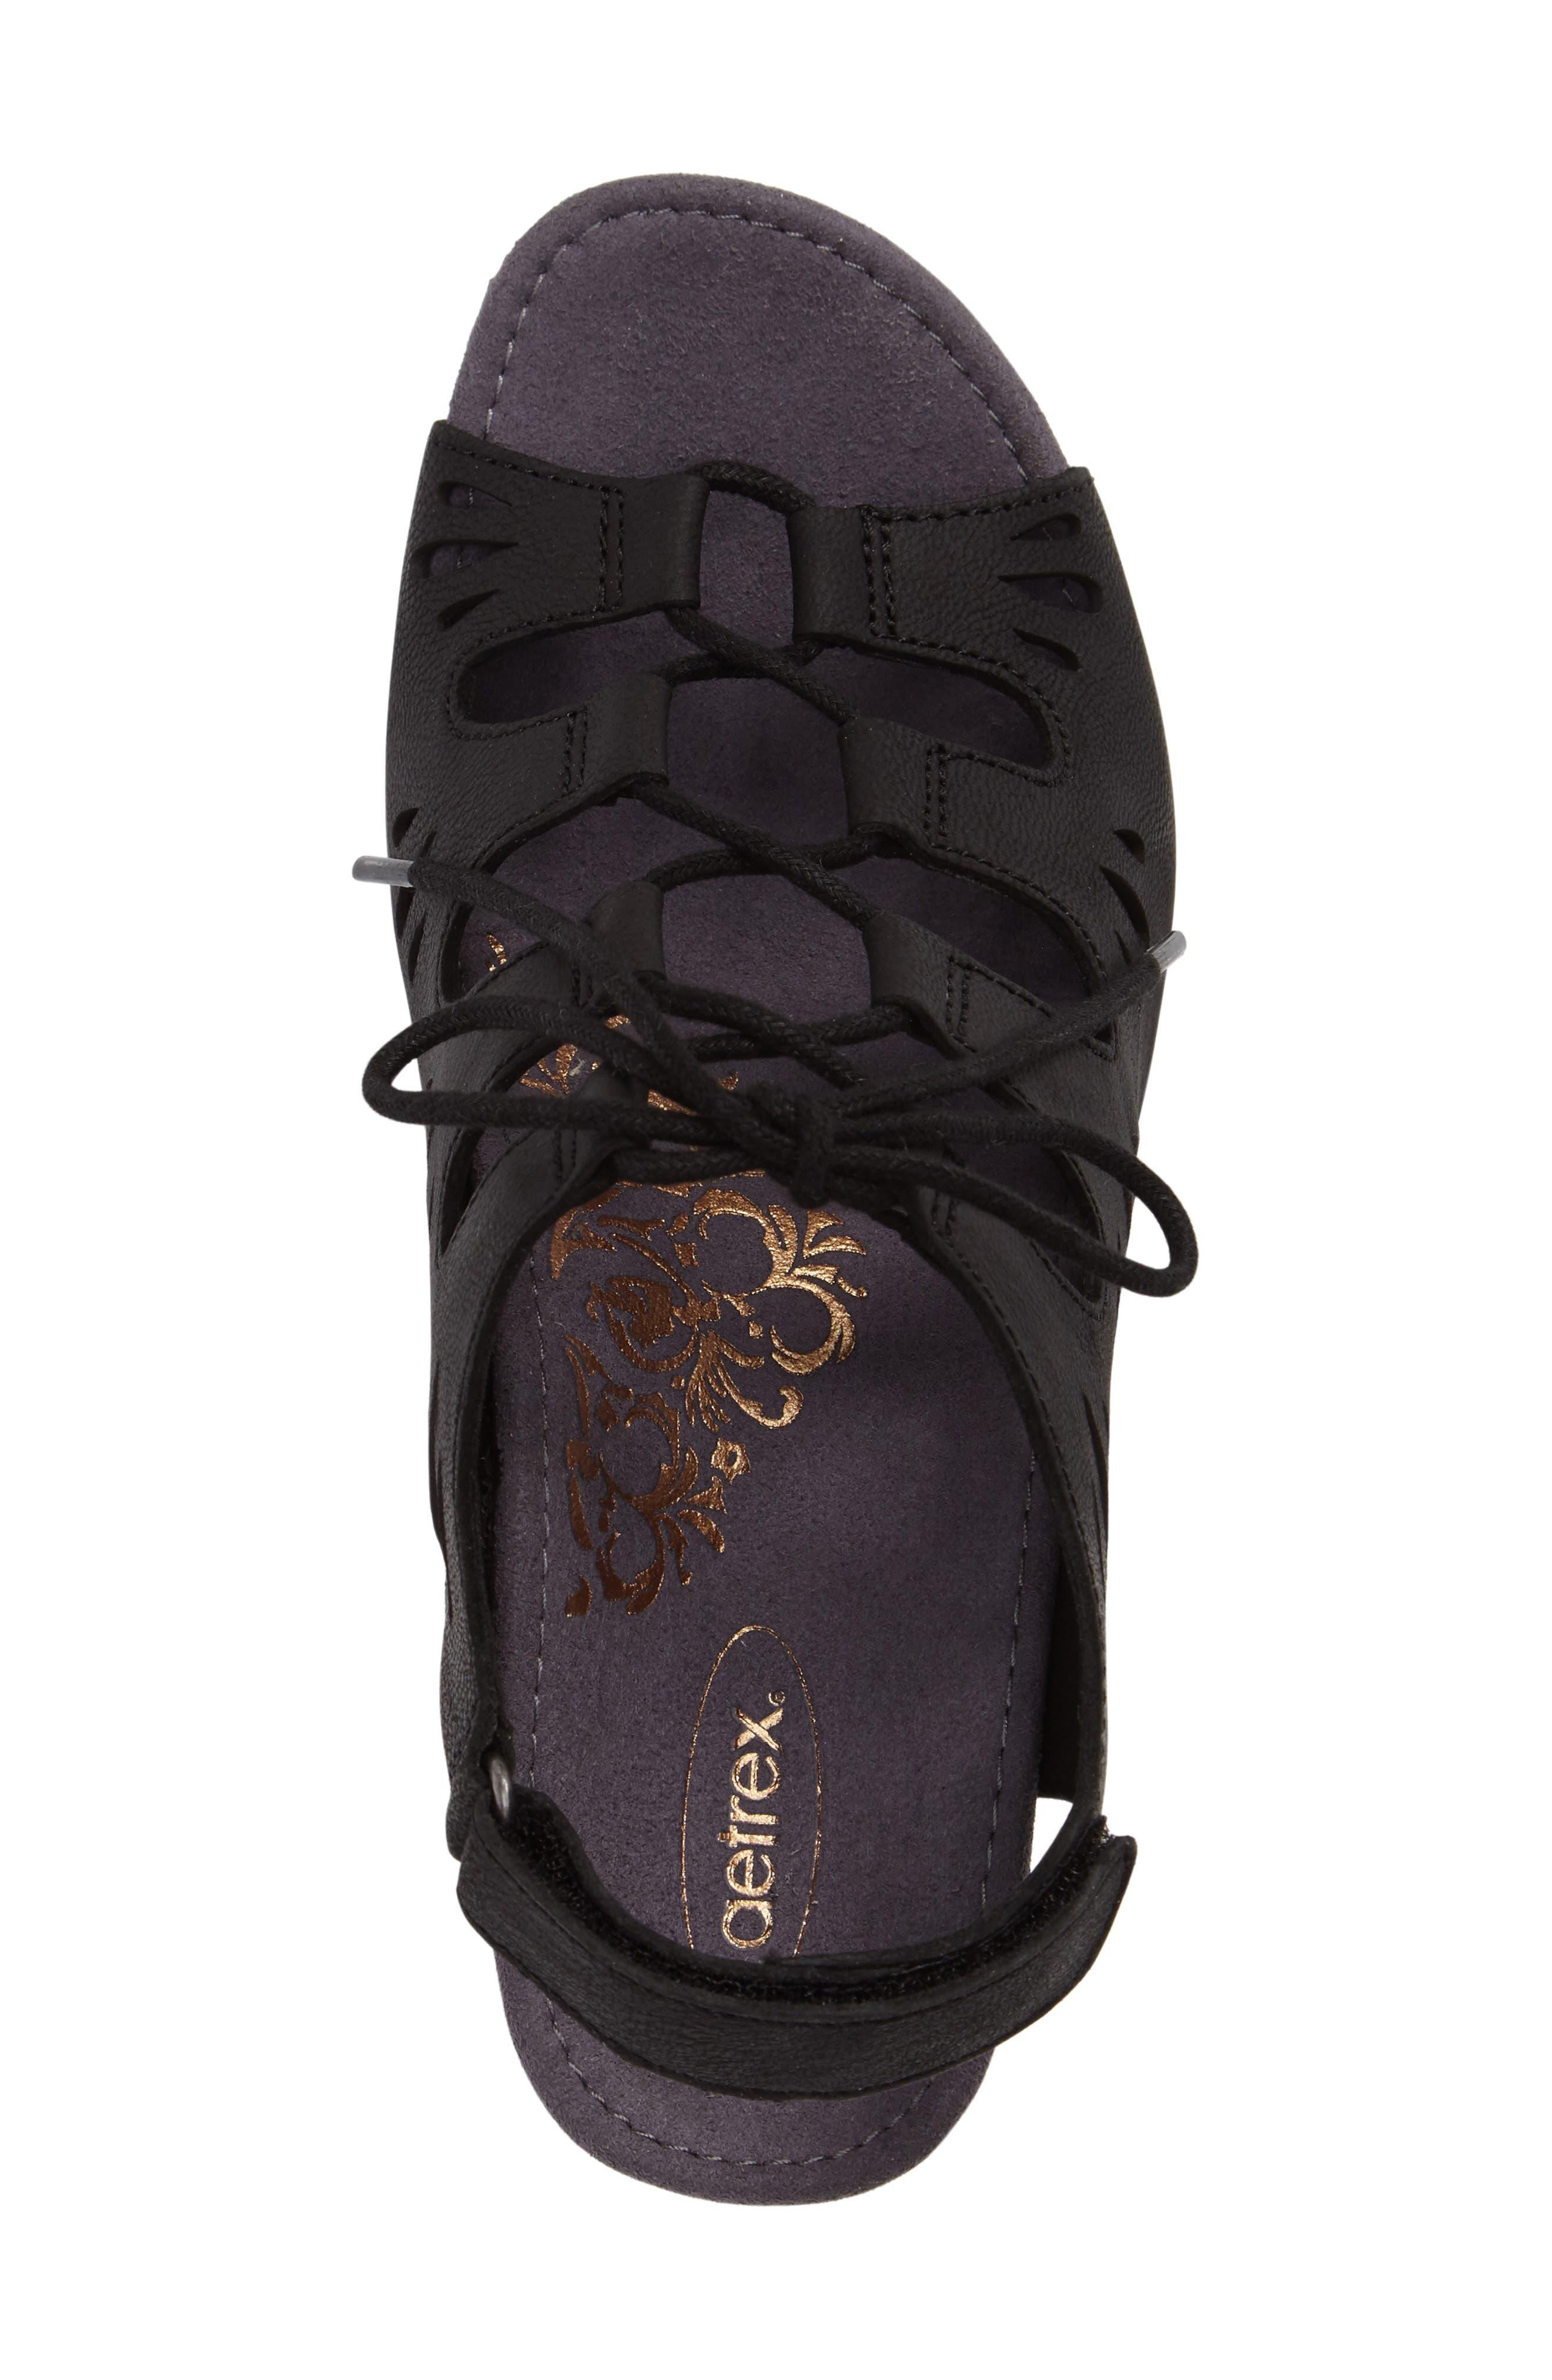 Giselle Slingback Wedge Sandal,                             Alternate thumbnail 5, color,                             Black Leather